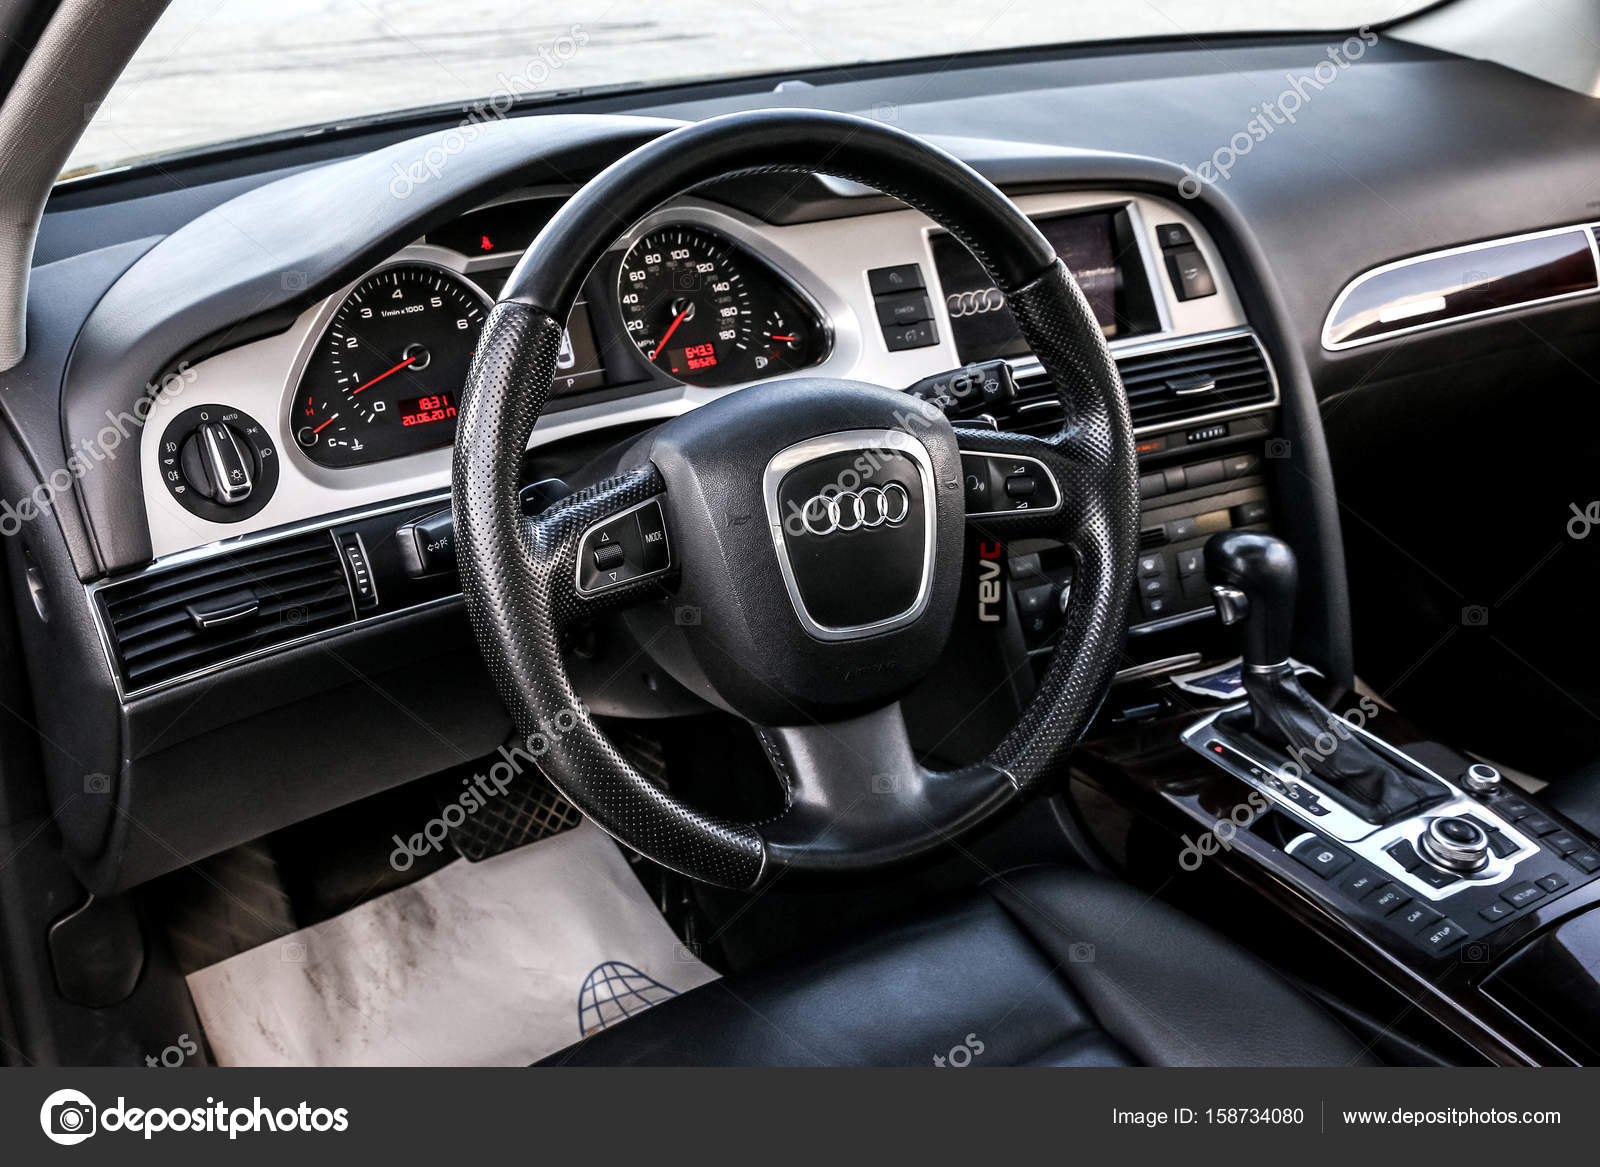 Innenraum des Audi A6 — Redaktionelles Stockfoto © Artzzz #158734080